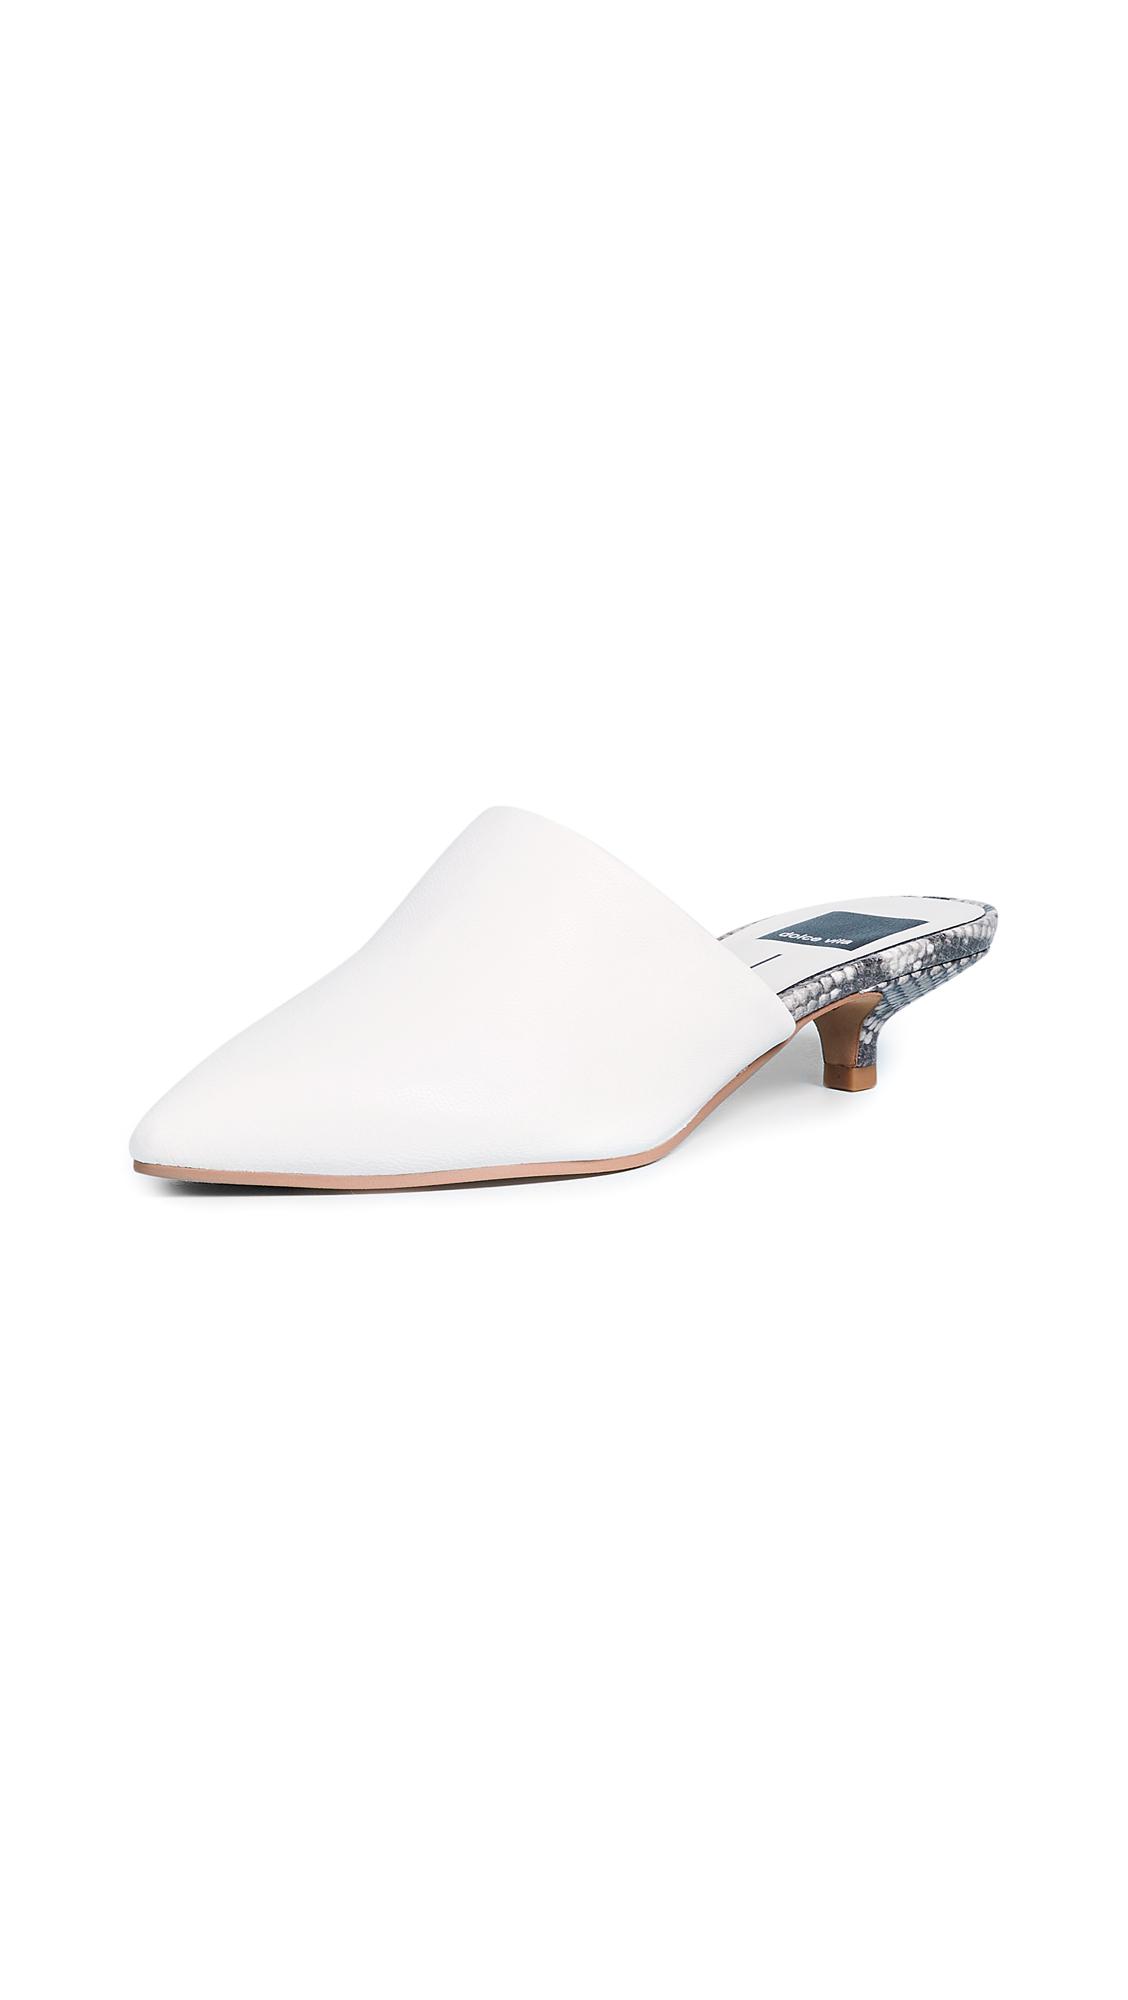 Dolce Vita Obie Point Toe Mules - Off White